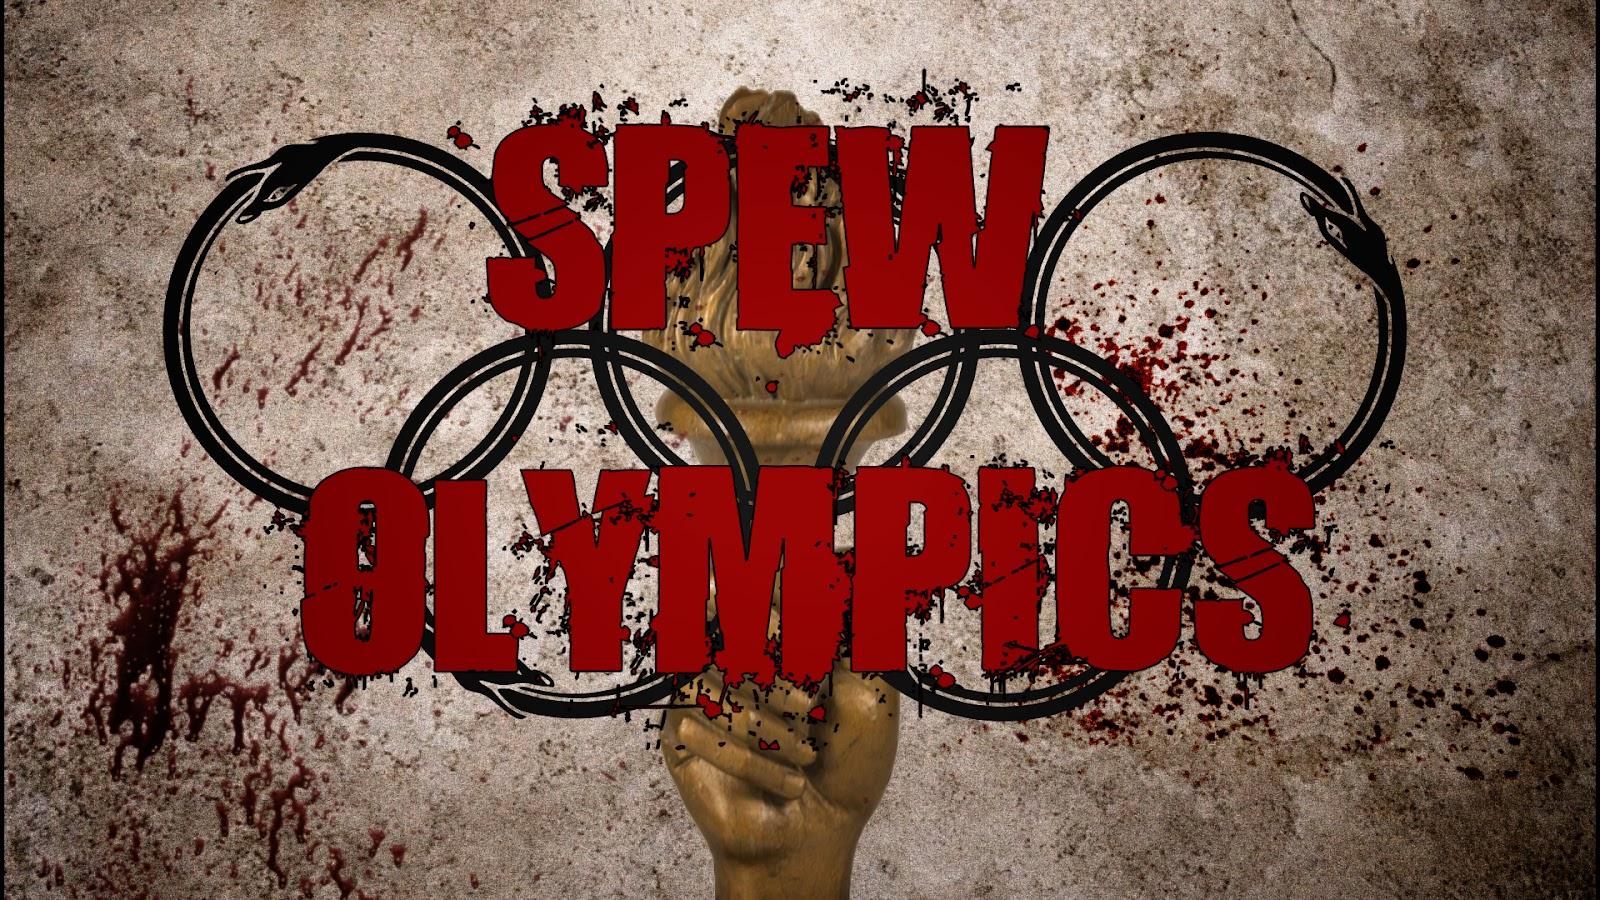 spew_olympics copy.jpg